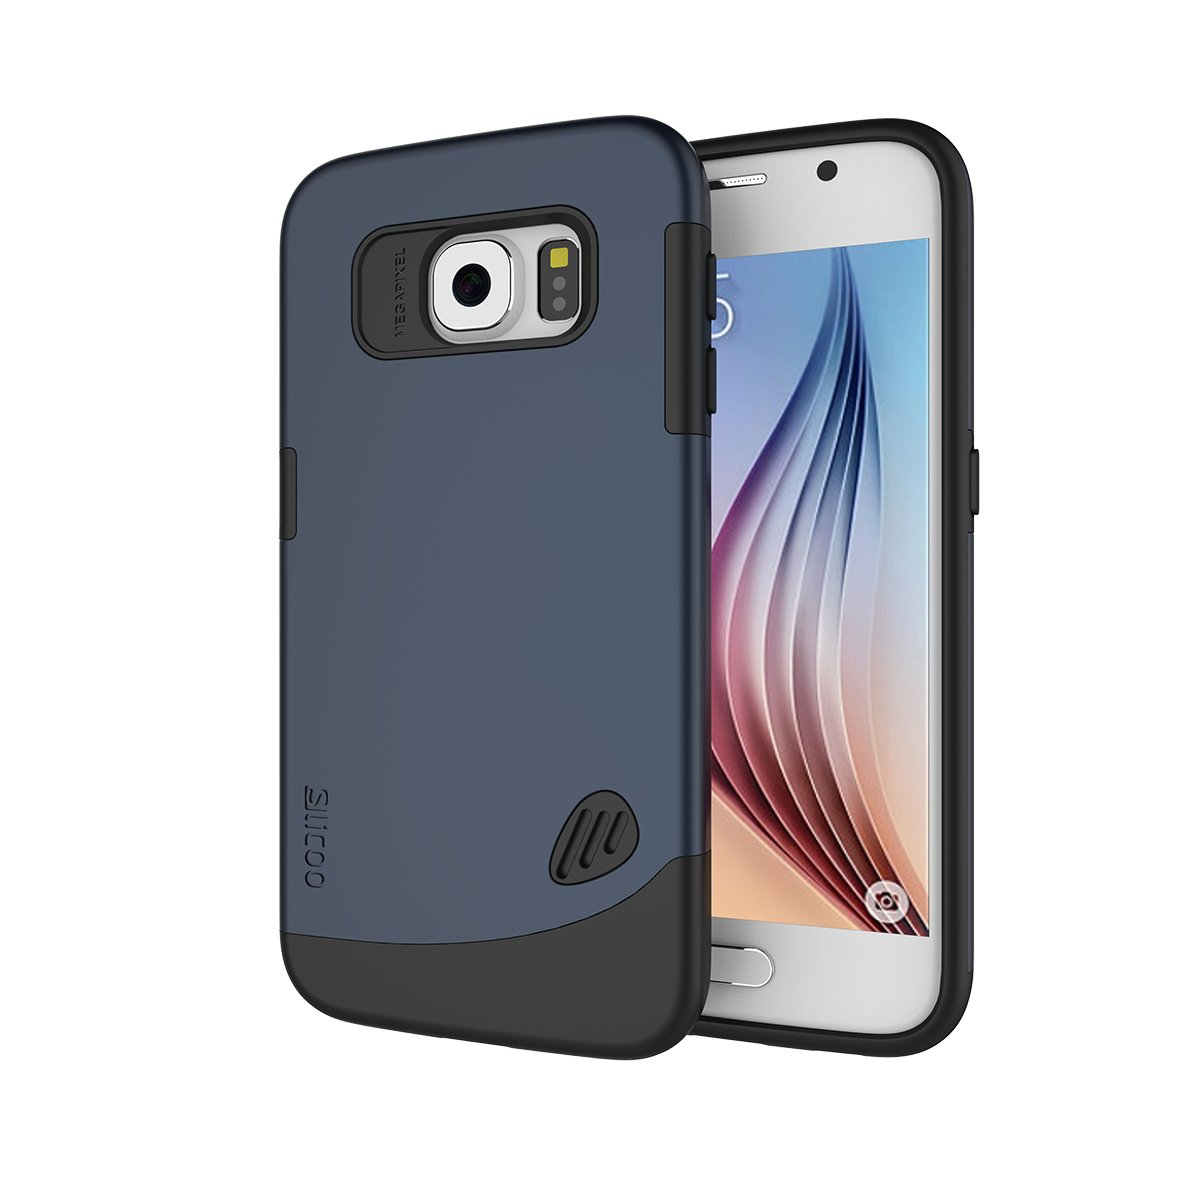 samsung s6 rubber phone case